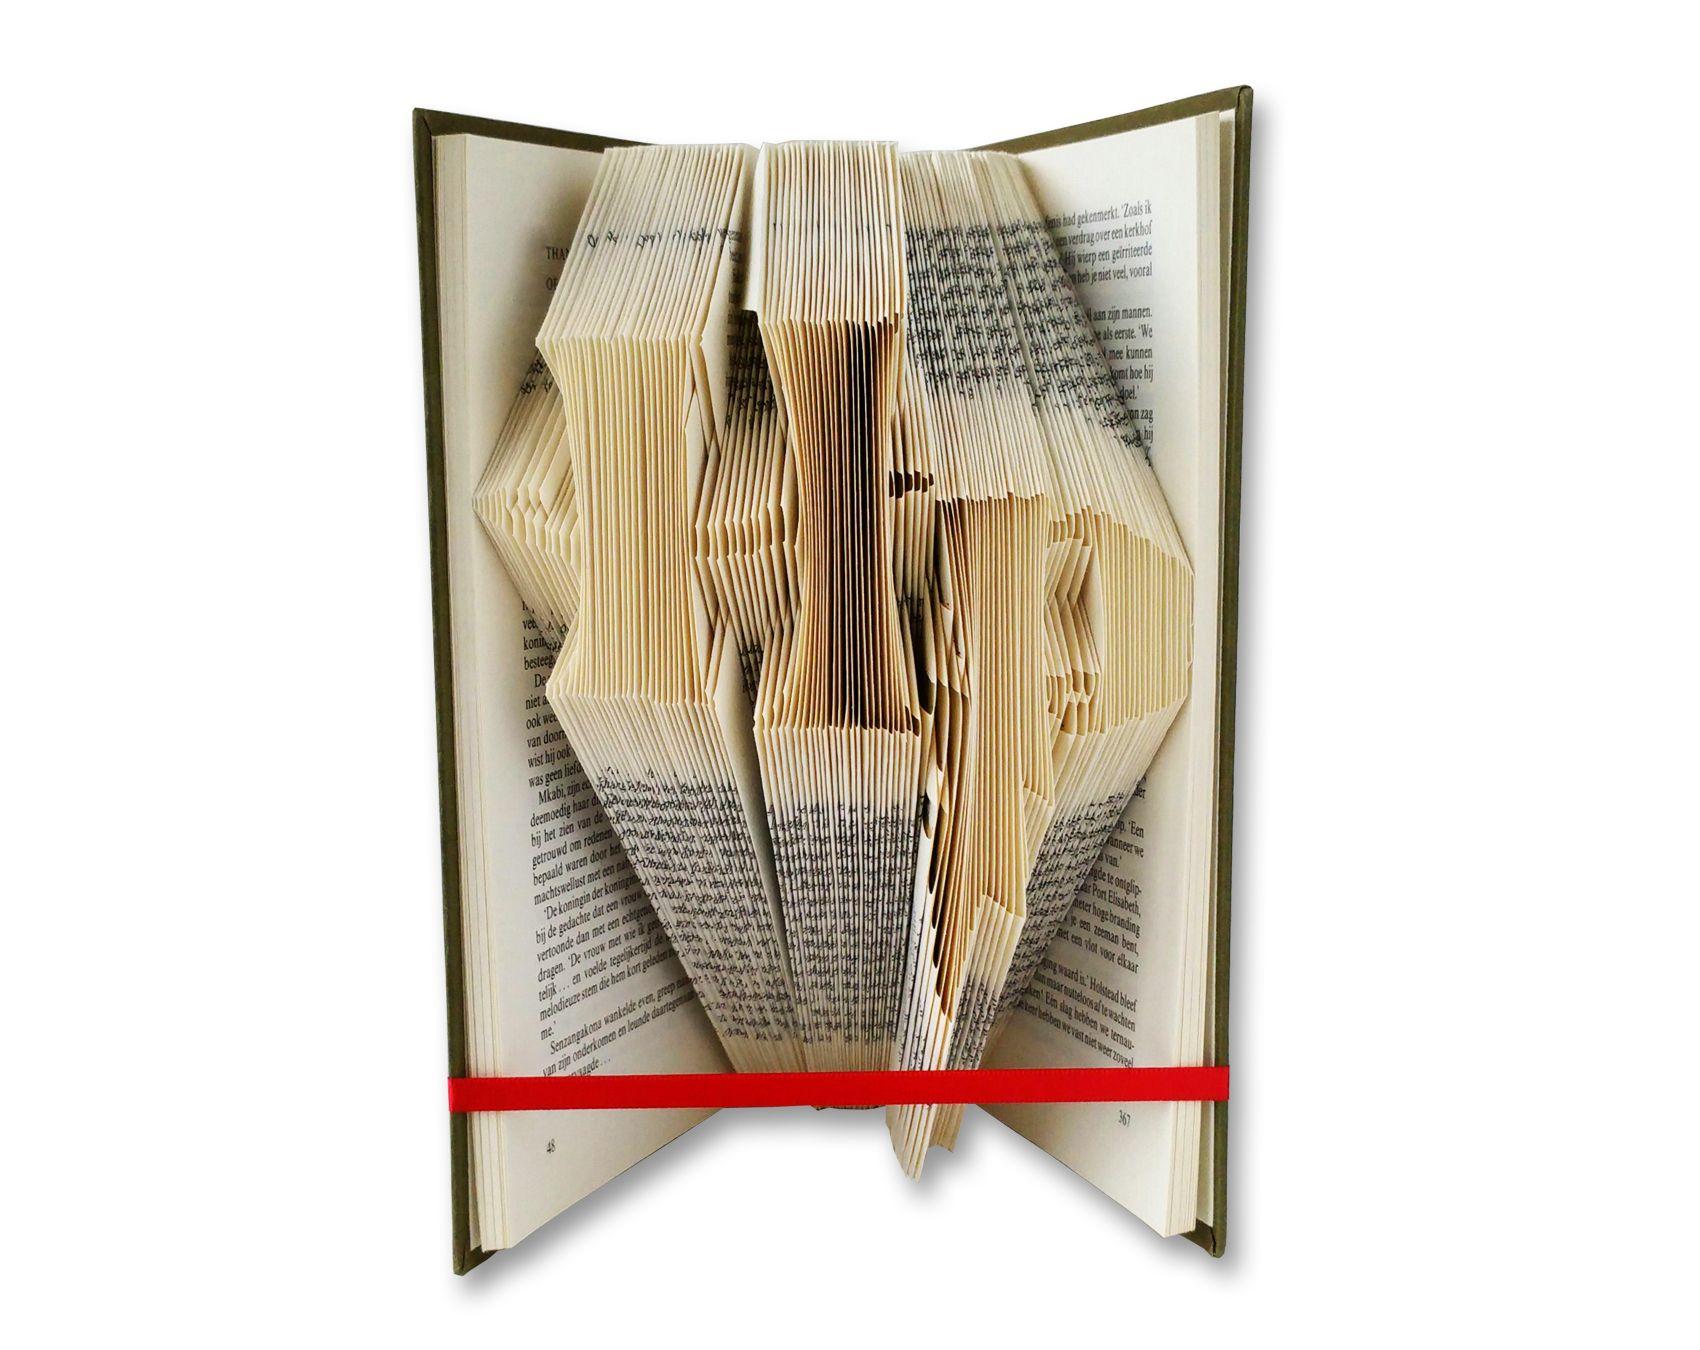 Folded Book Art Pattern Harry Potter Logo Folded Book Art Patterns Folded Book Art Pattern Folded Book Art Book Folding Patterns Free Templates